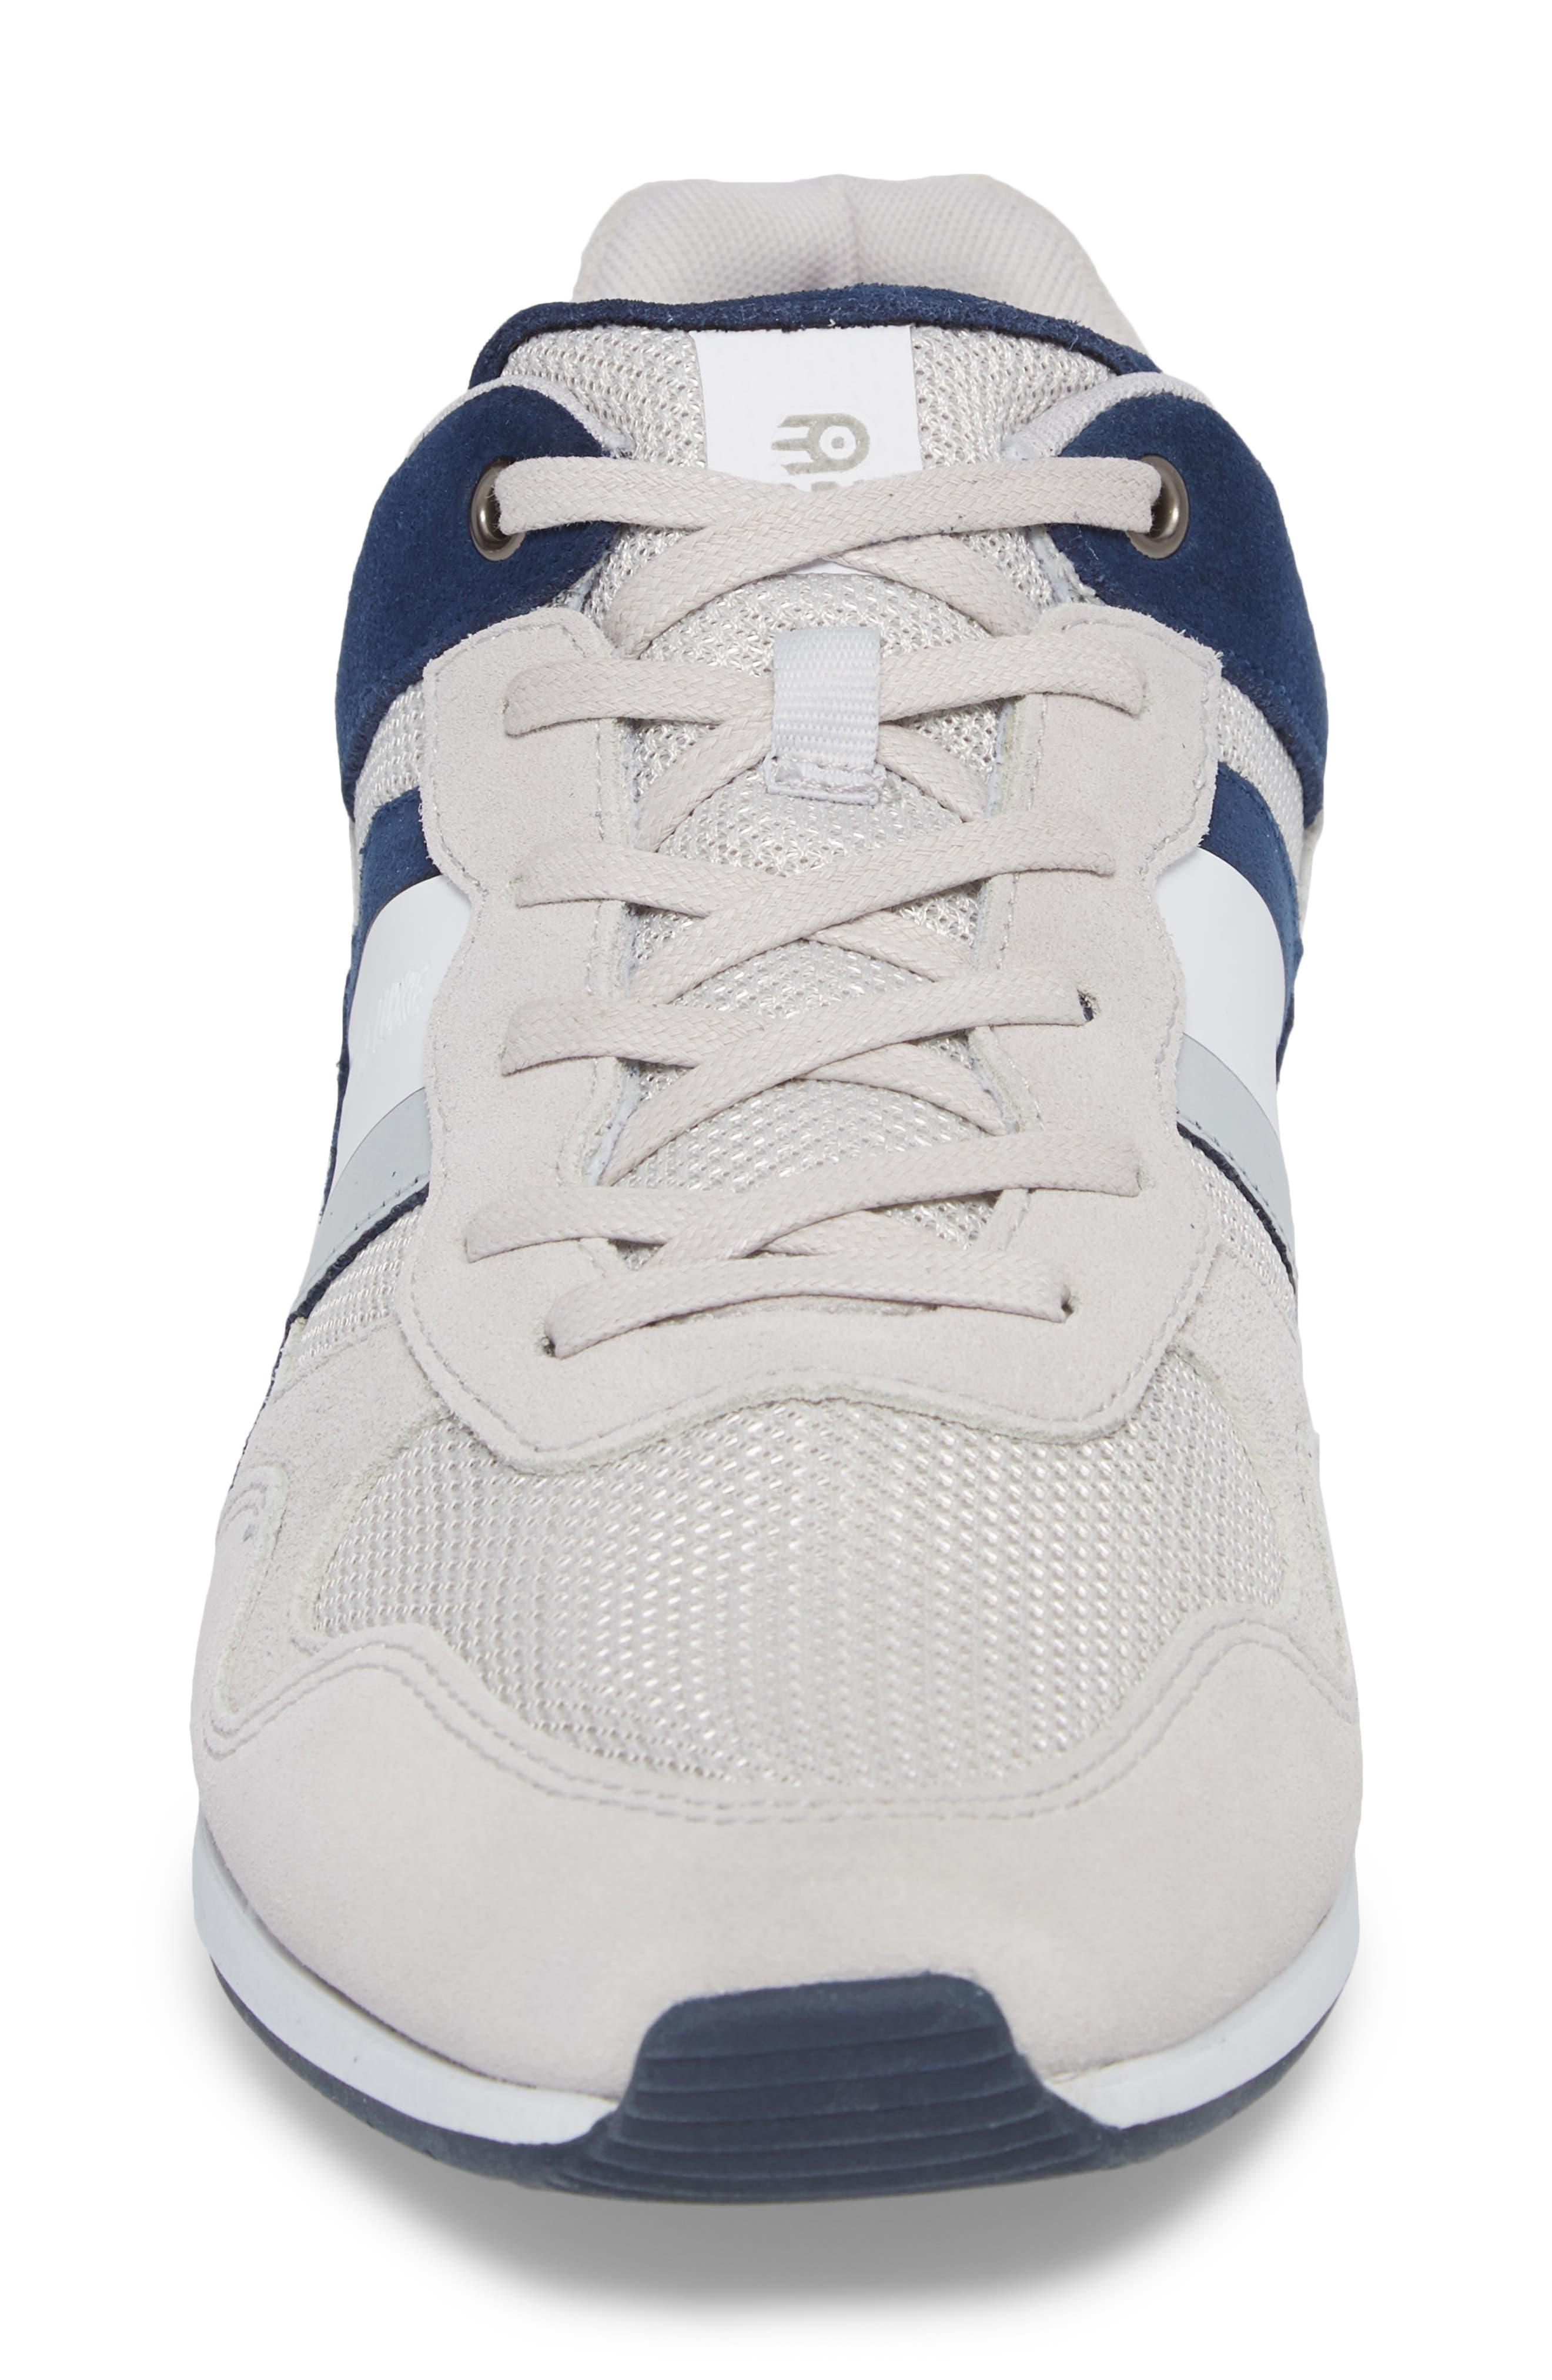 Scarpo Low Top Sneaker,                             Alternate thumbnail 4, color,                             020